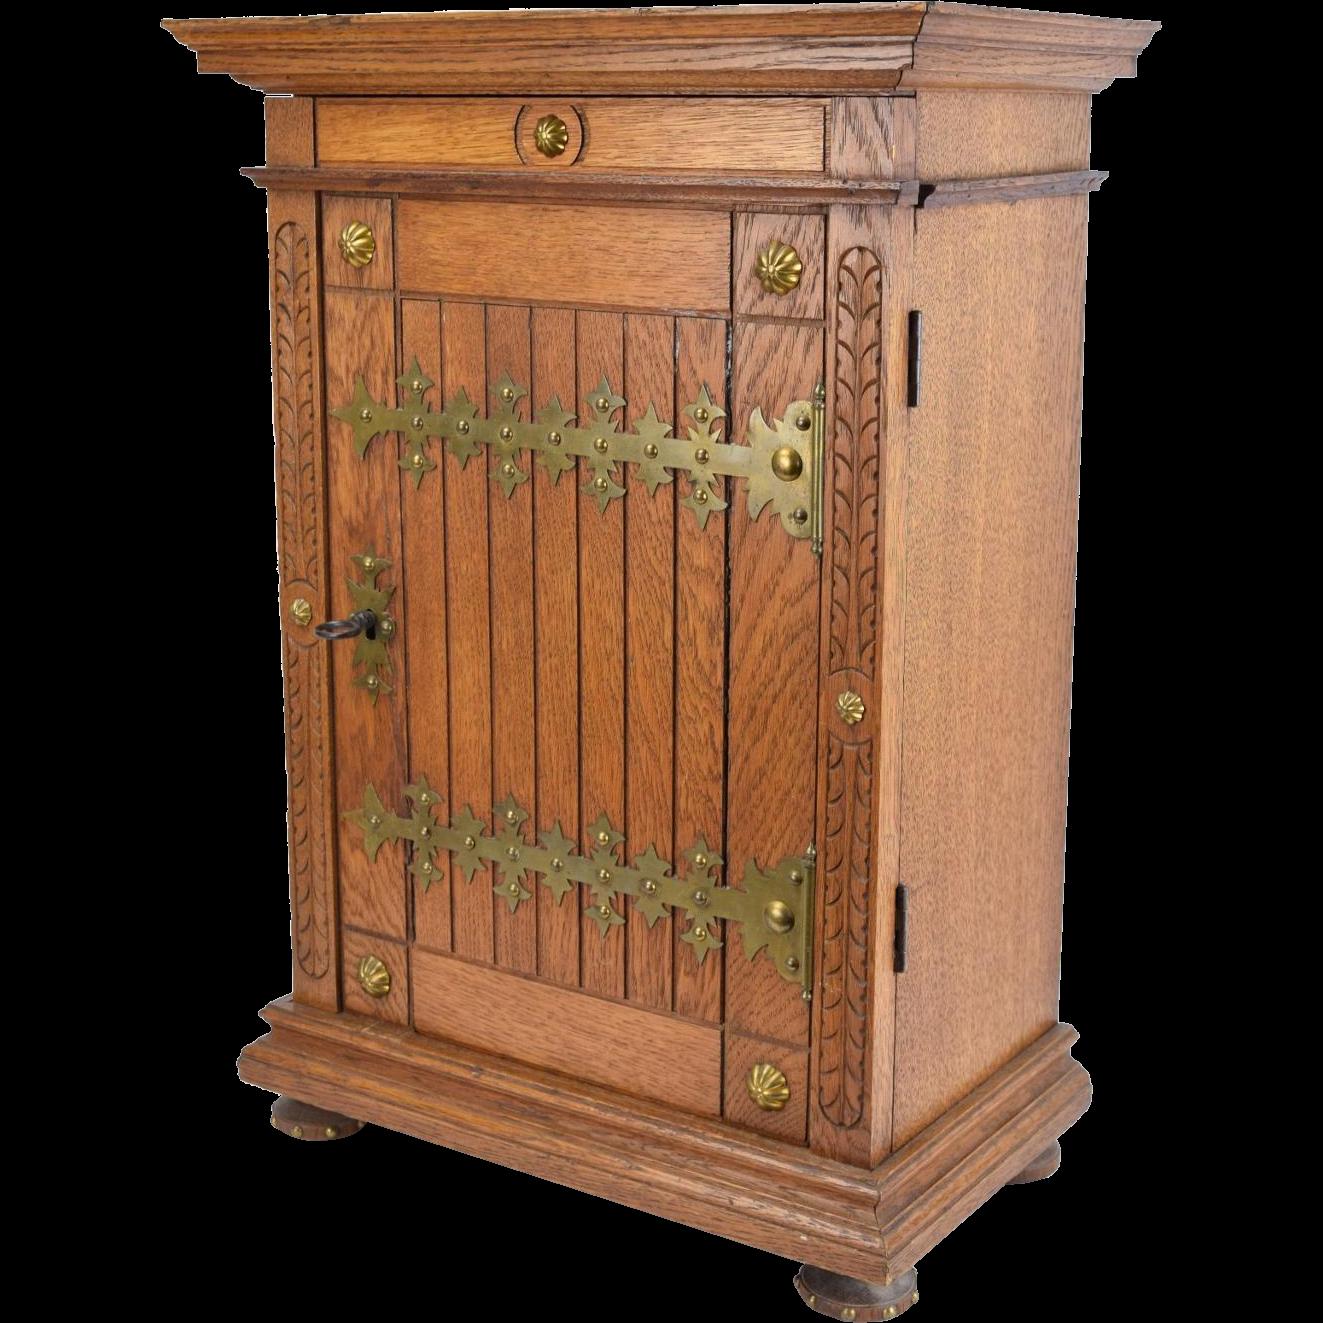 Gothic Revival Oak Locking Wall Cabinet w Strap Hinges Adjustable Shelves